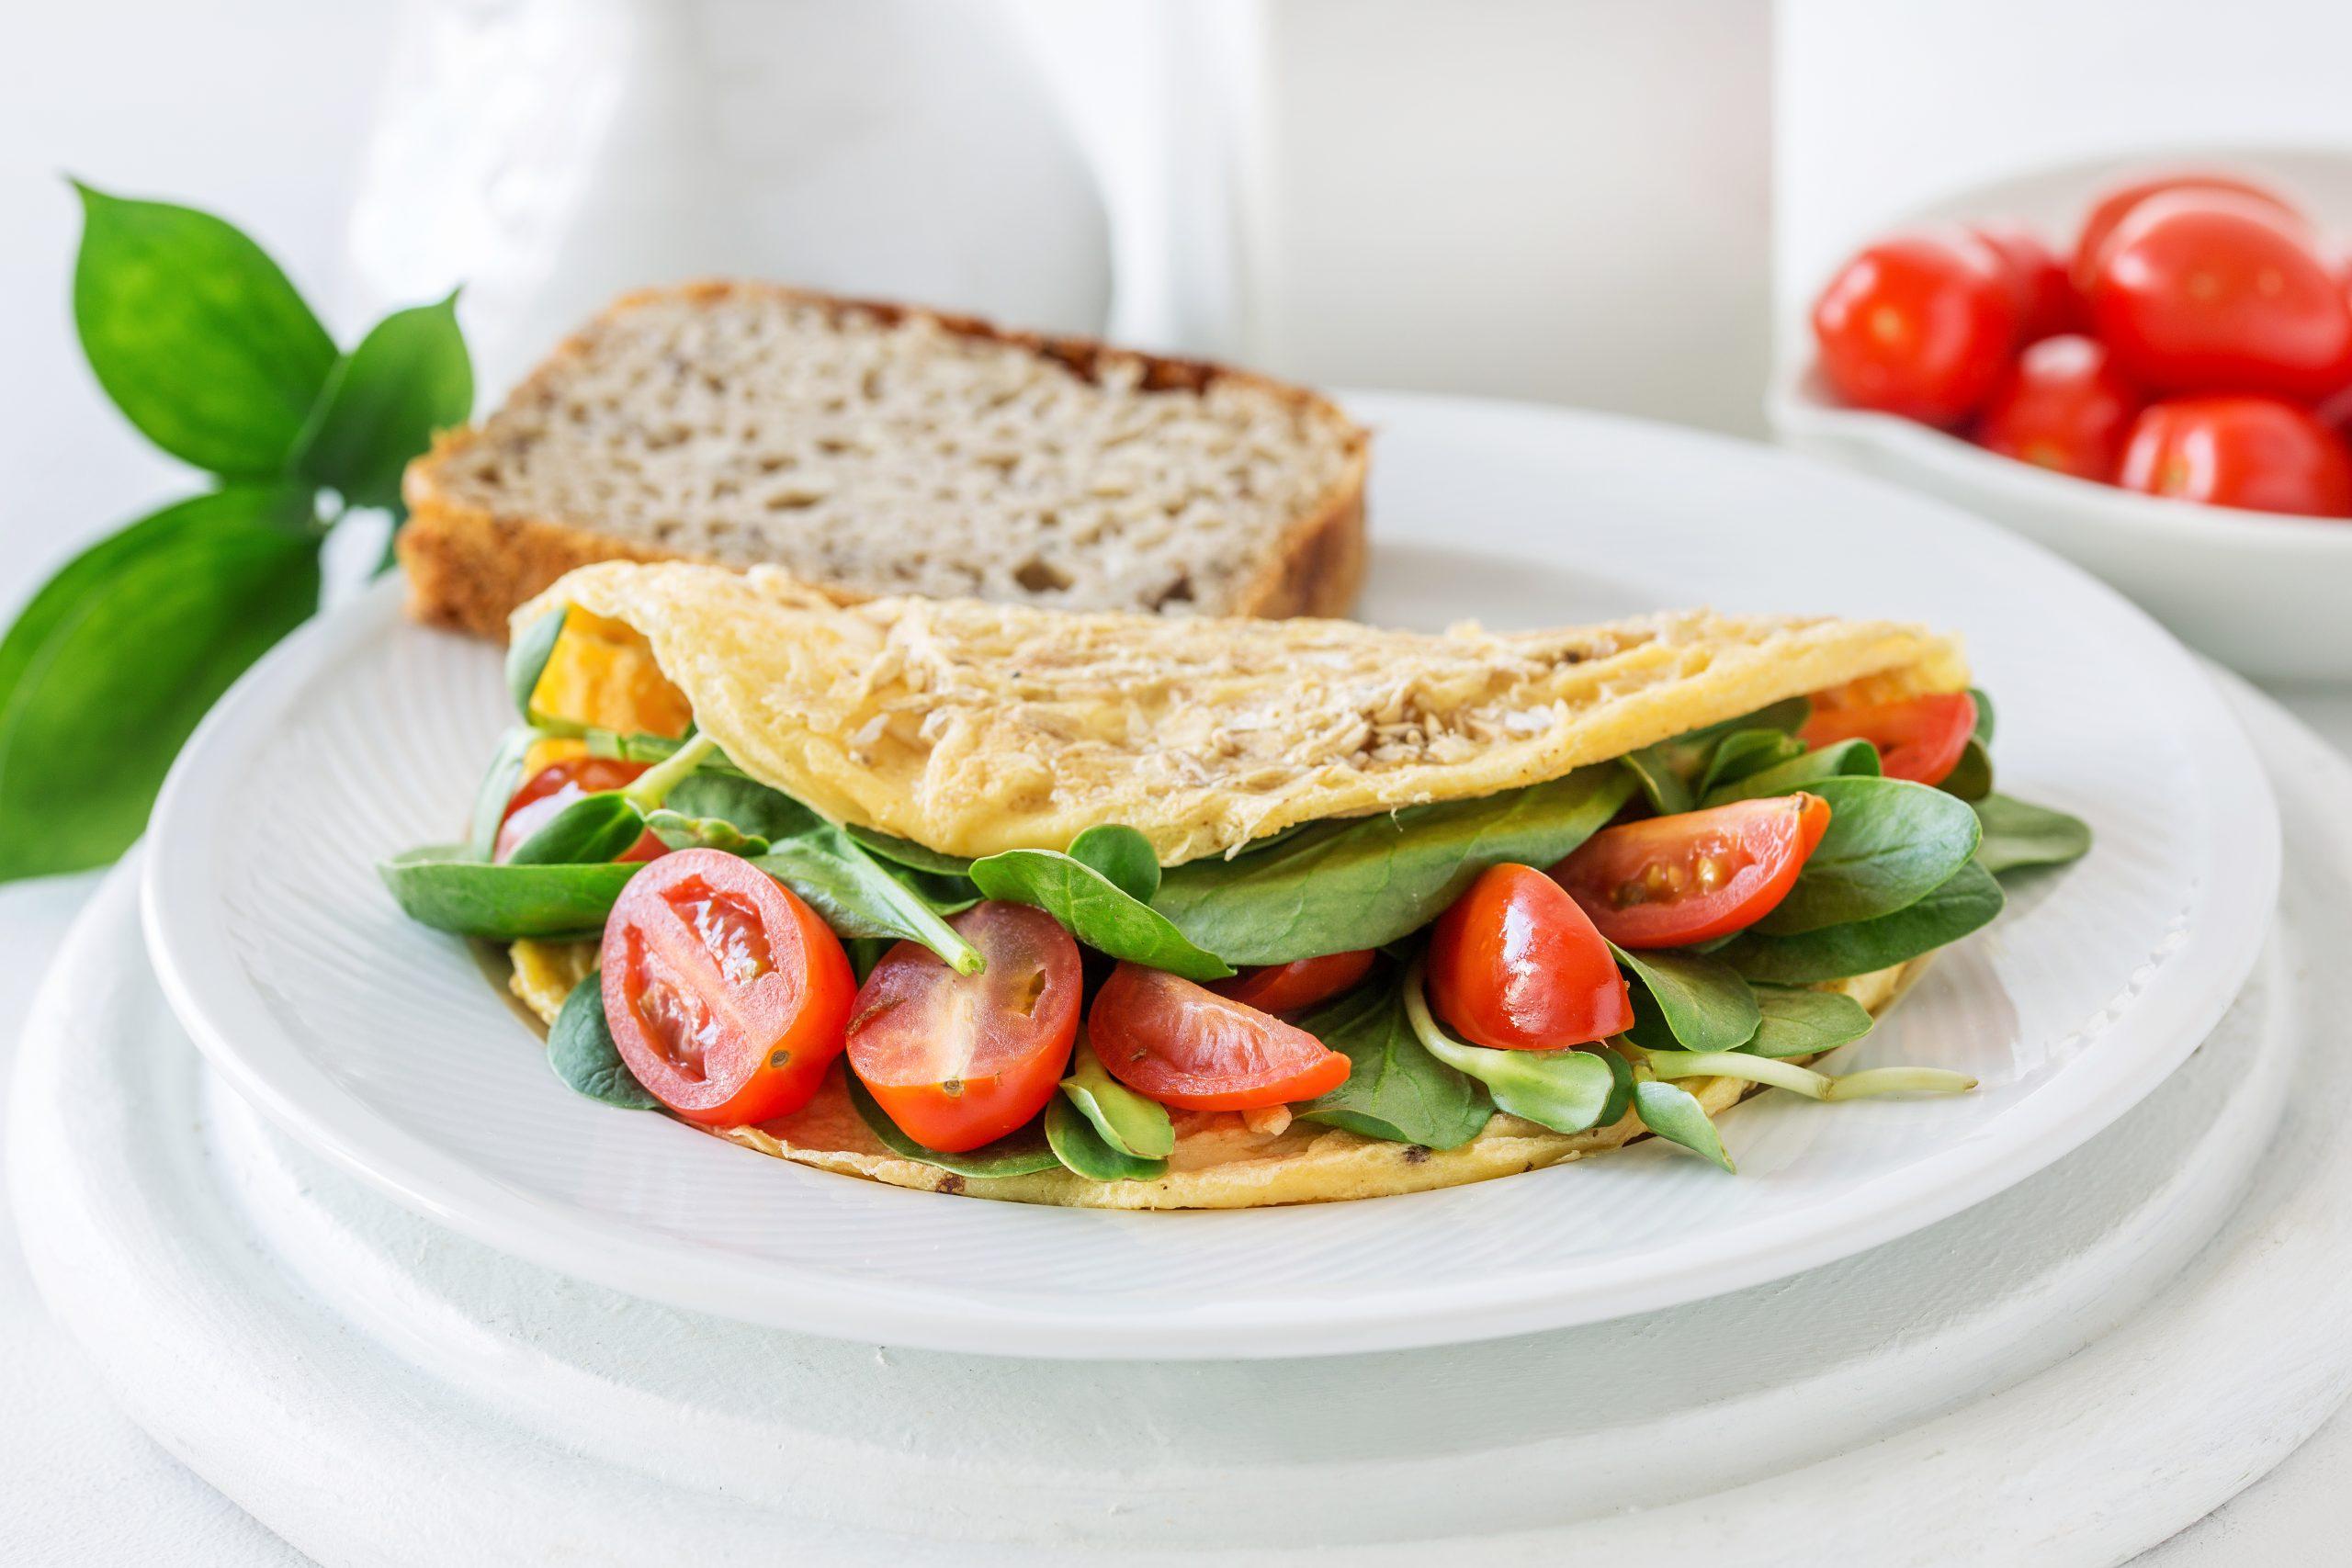 Omlet z otrębami pszennymi